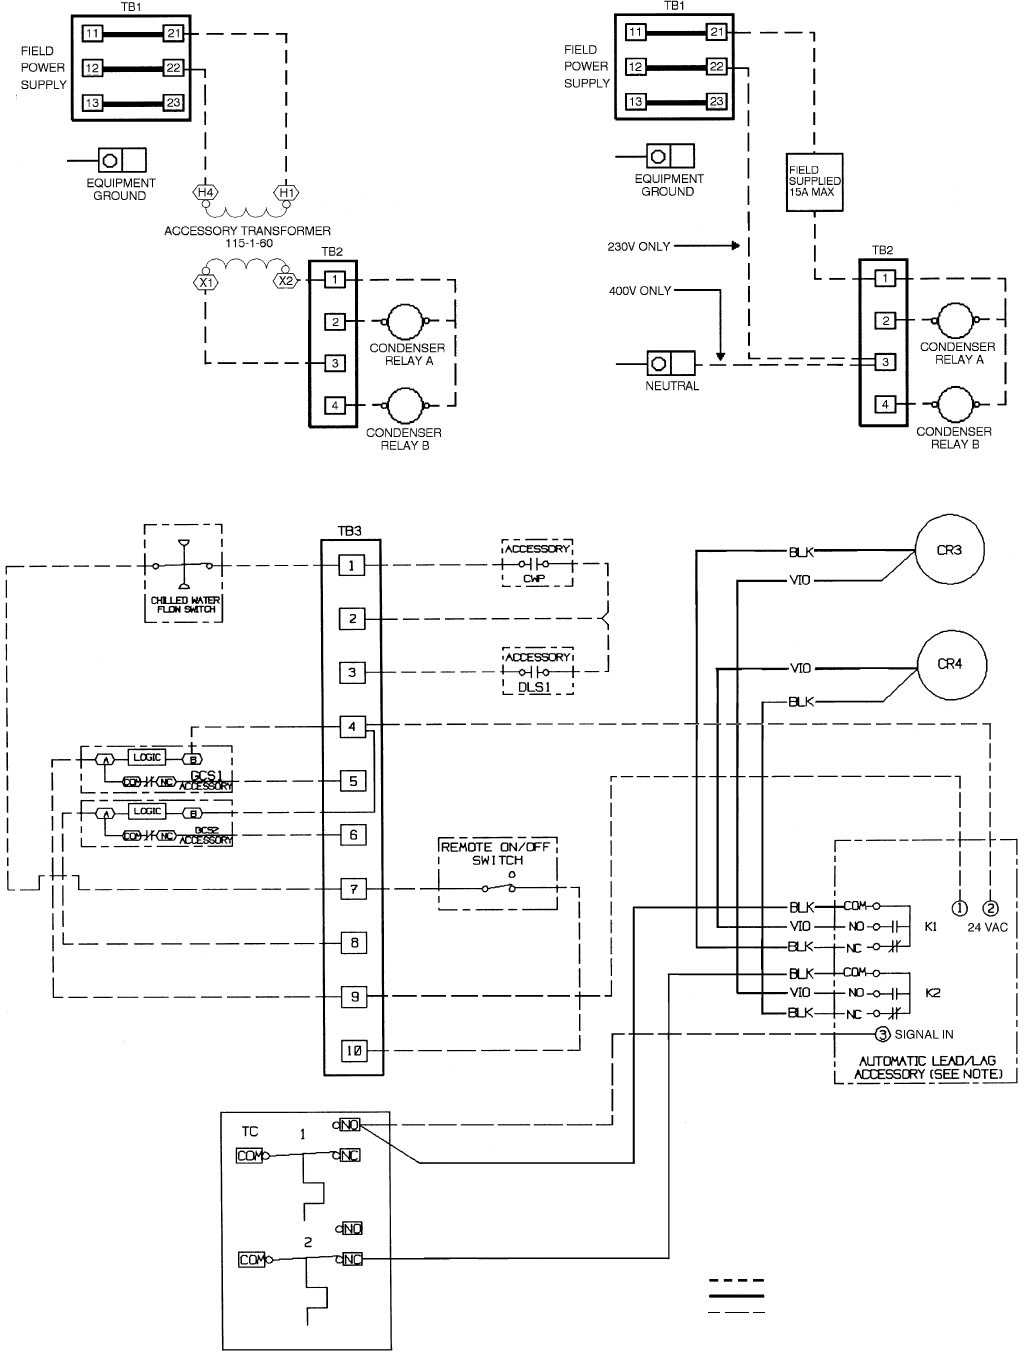 bg16?resize\=665%2C879\&ssl\=1 carrier 30gx chiller wiring diagram carrier water chillers carrier 30gx chiller wiring diagram at suagrazia.org